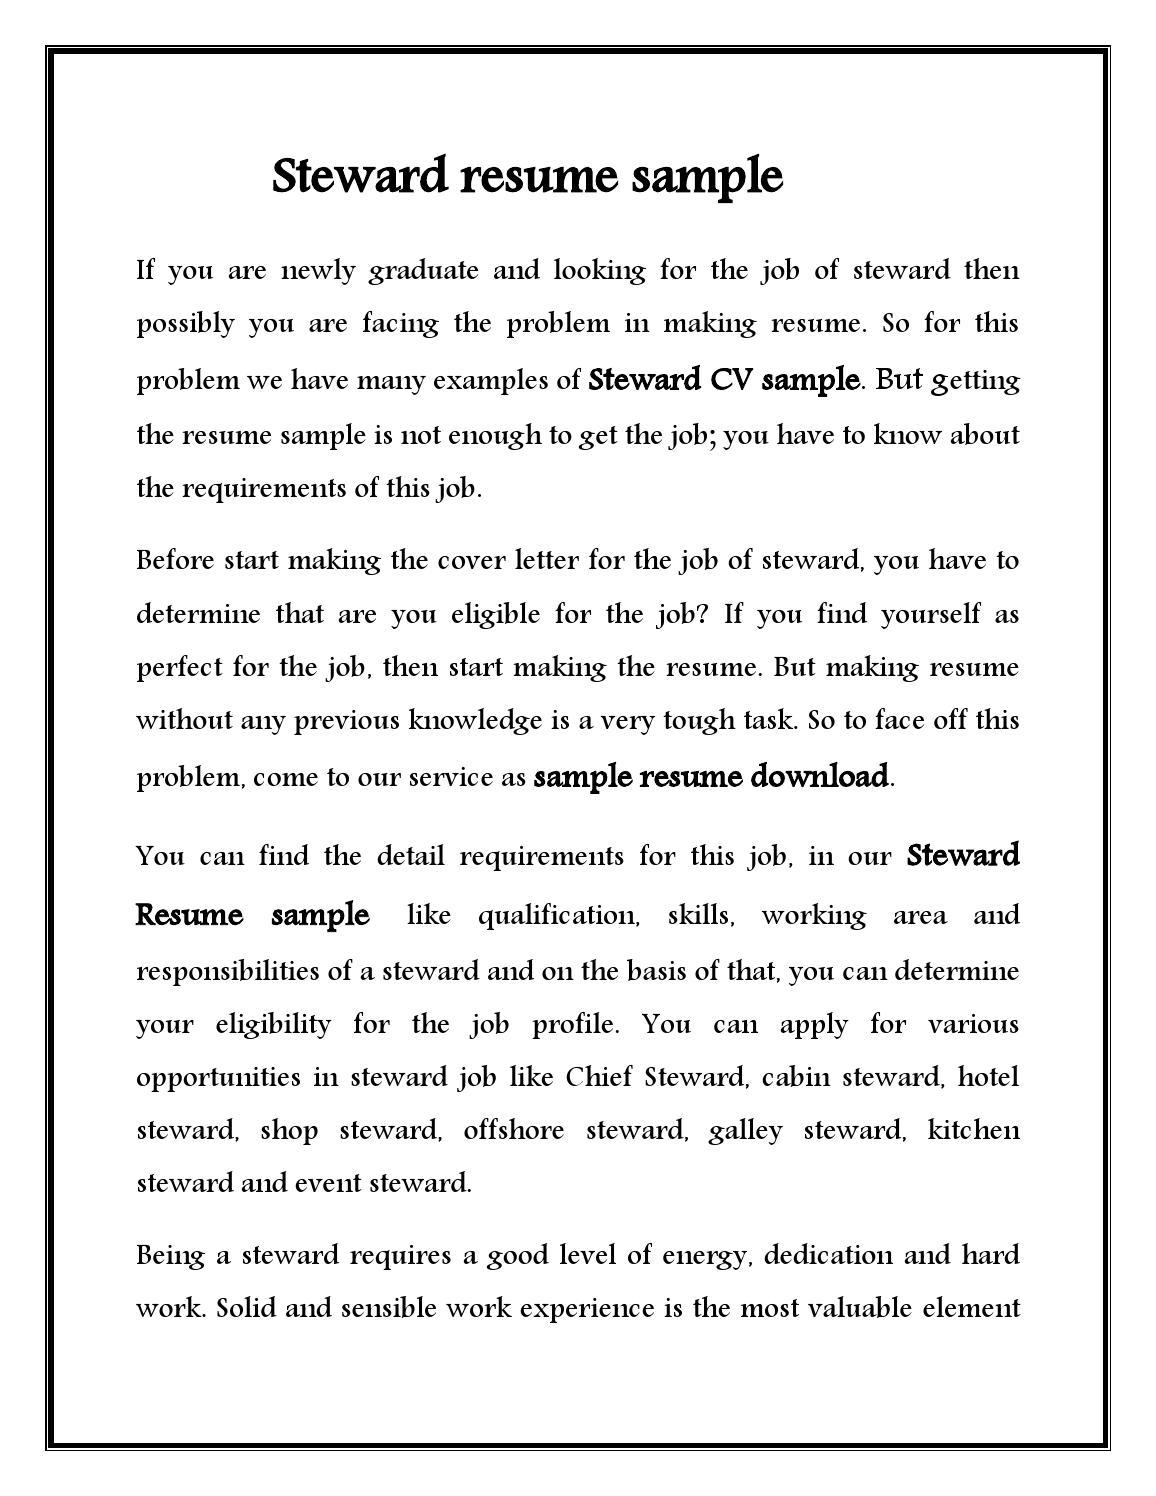 Resume Sample For Kitchen Steward